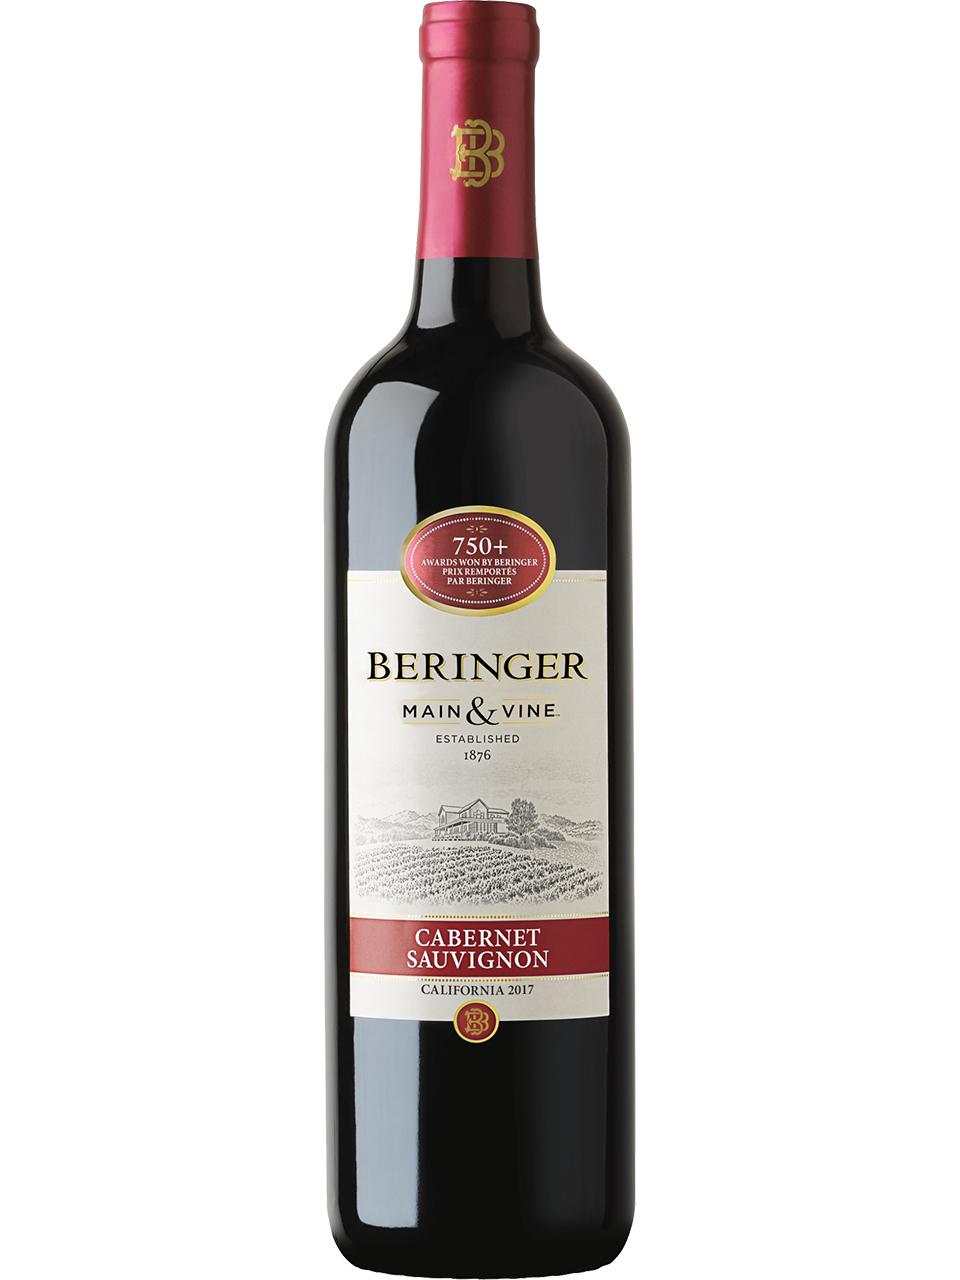 Beringer Main & Vine Cabernet Sauvignon